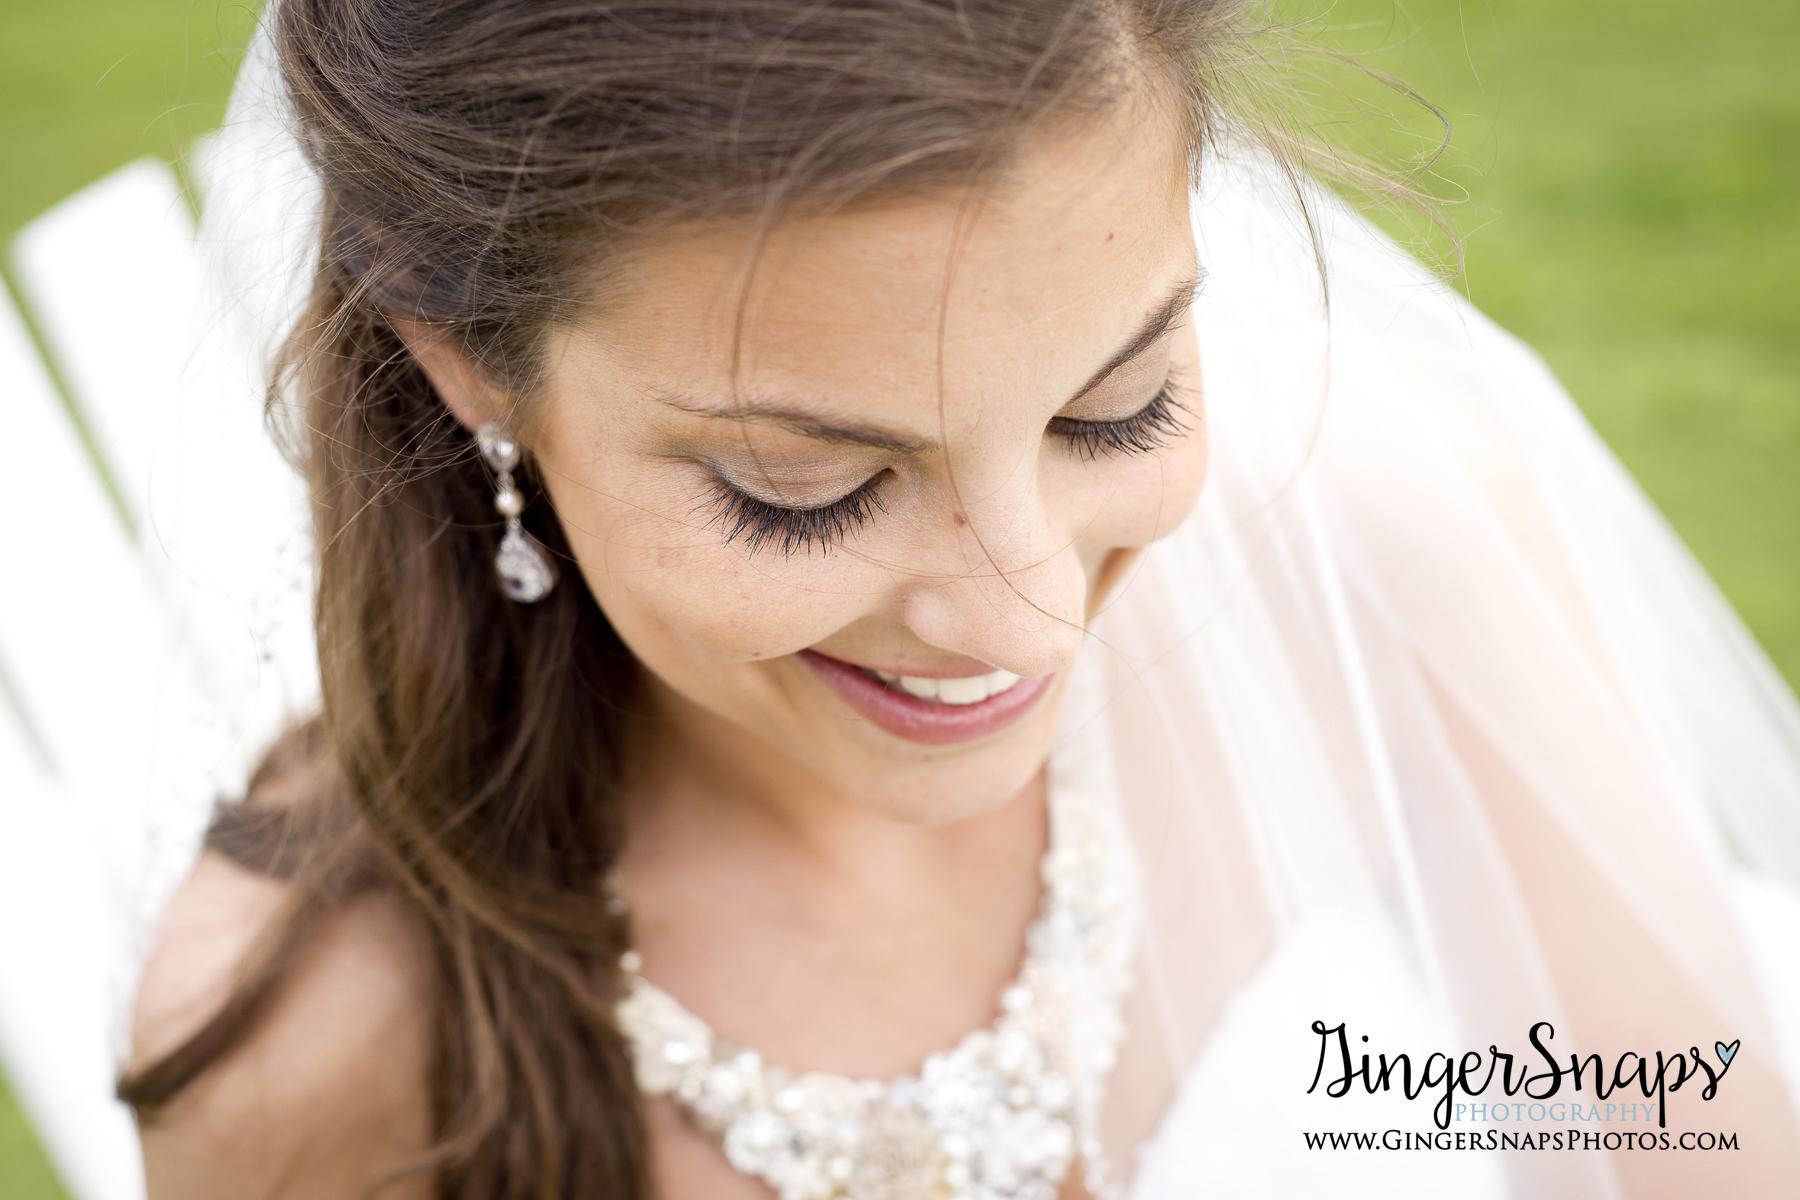 GingerSnaps Photography - 25.jpg